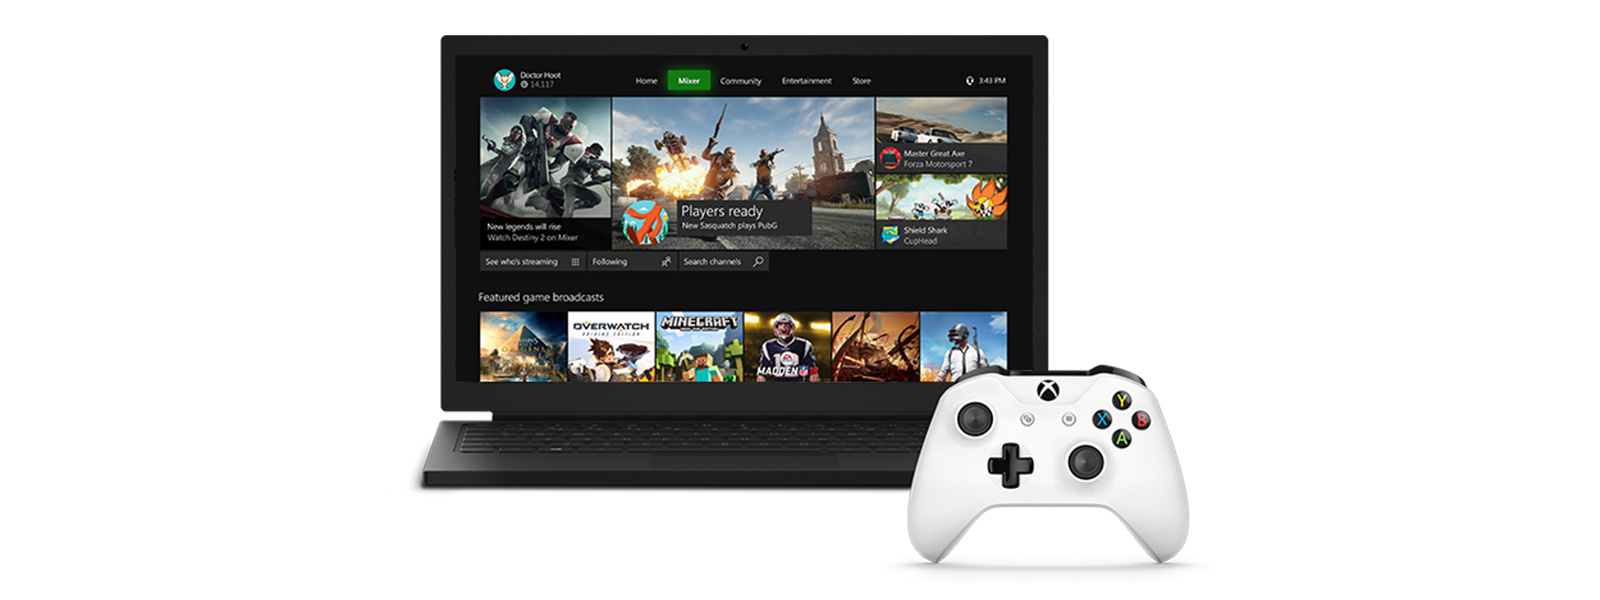 Windows 10 게임을 위한 새로운 Mixer 인터페이스